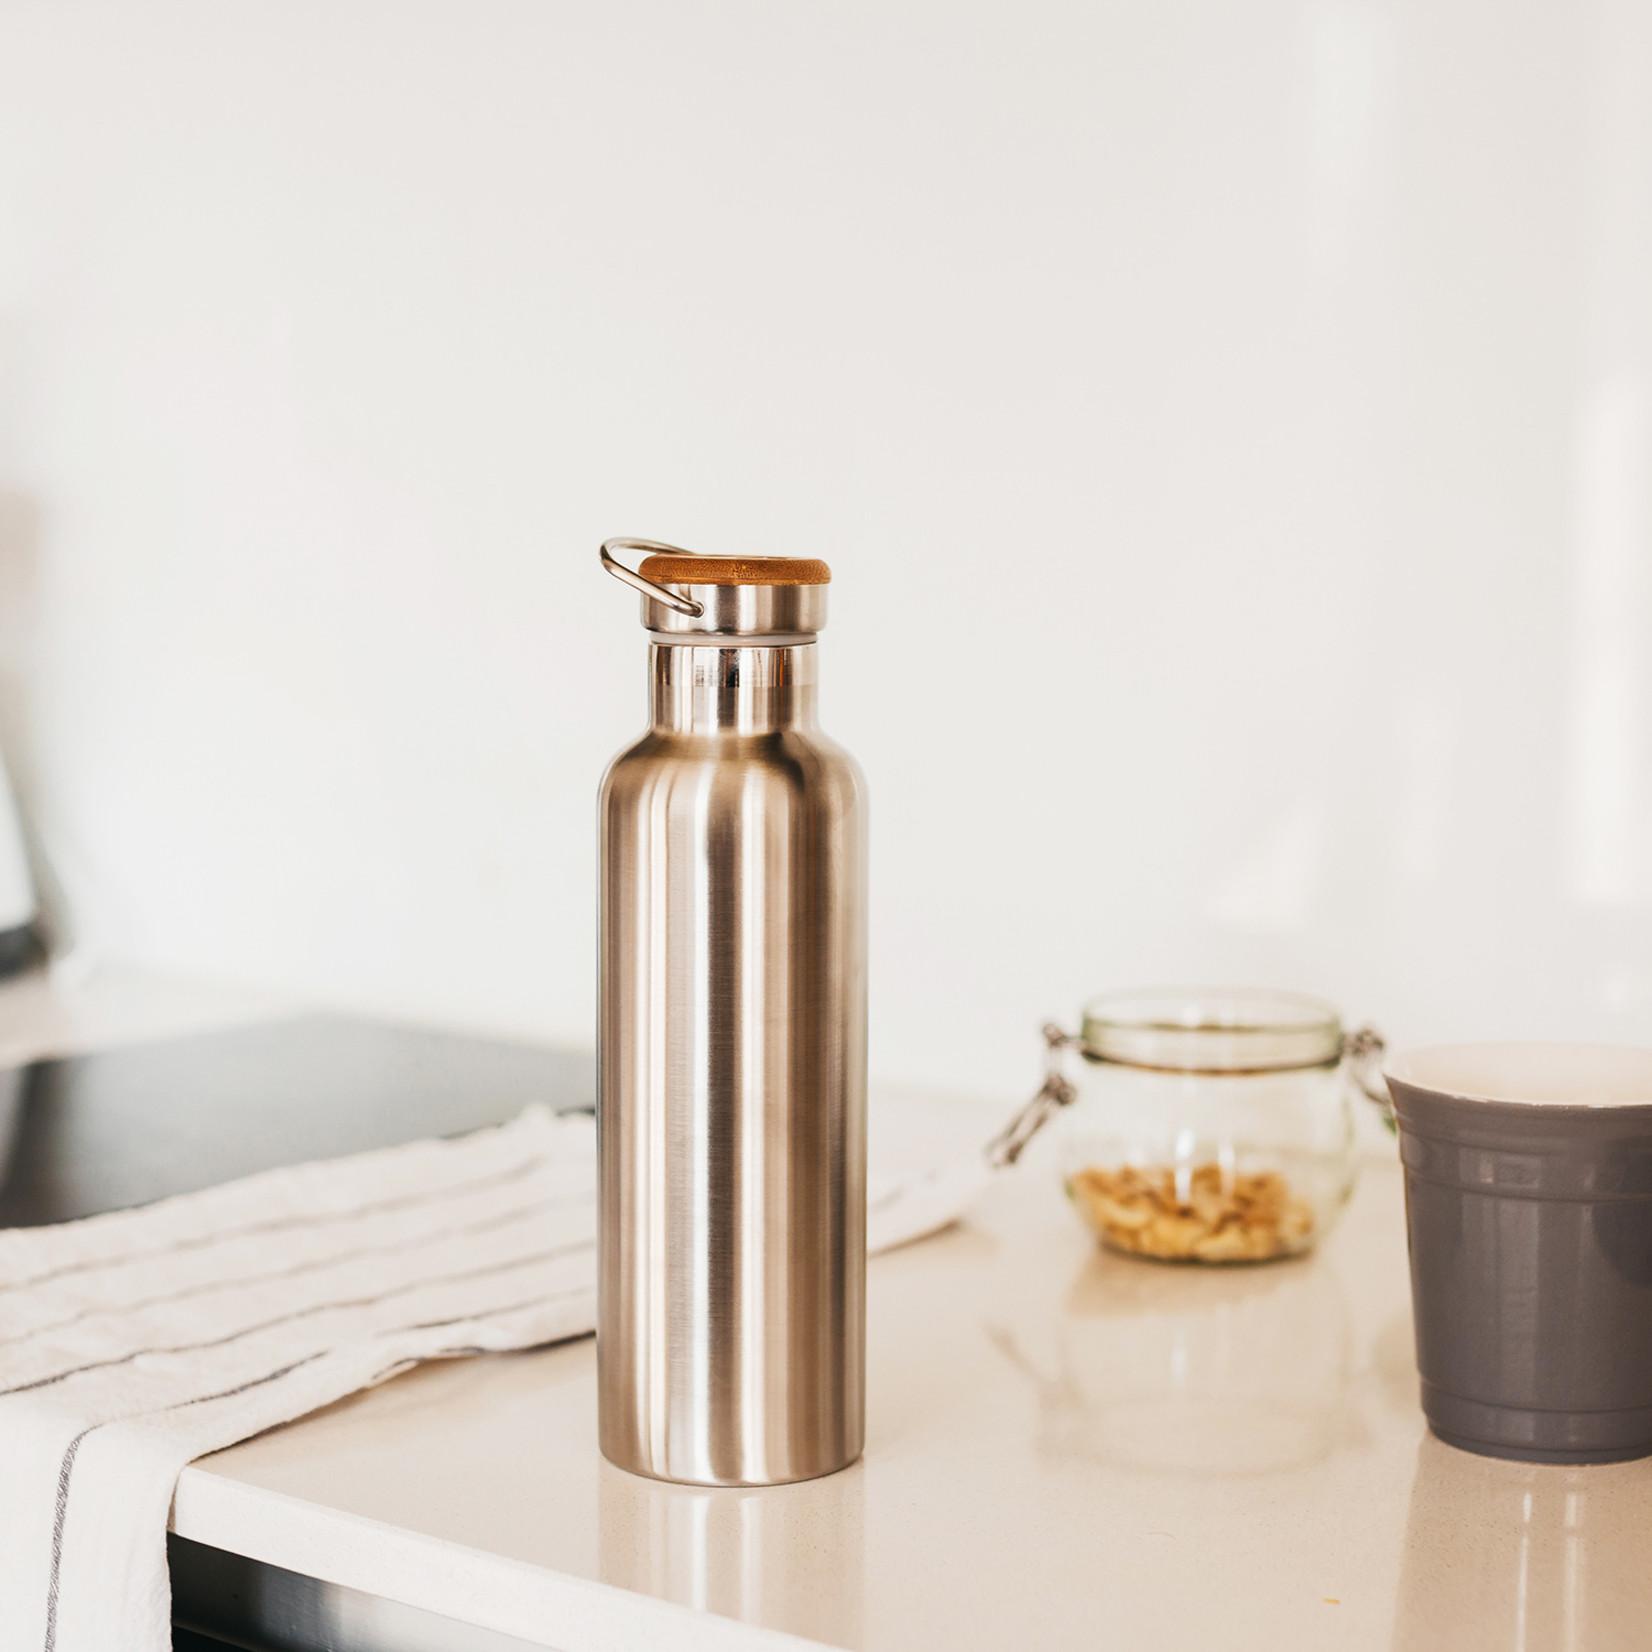 Bambaw BAMBAW - Insulated stainless steel bottle - 500ml, 750ml & 1000ml